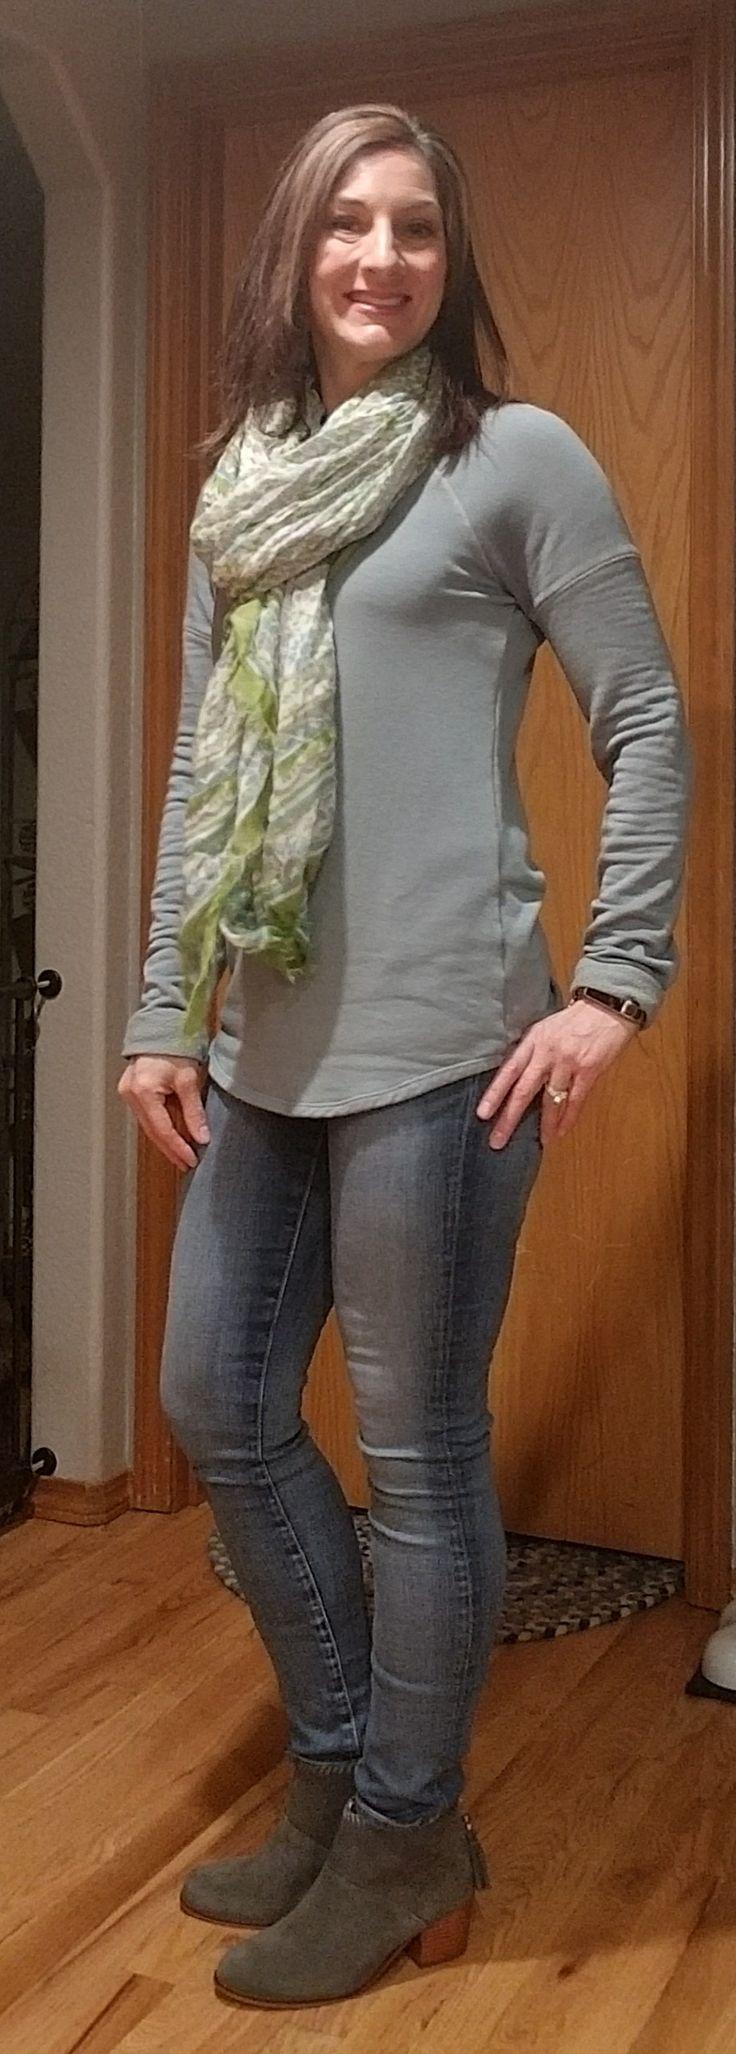 Stateside Kirsta Sweatshirt, scarf, AG slim straight ankle jeans, Tom's booties